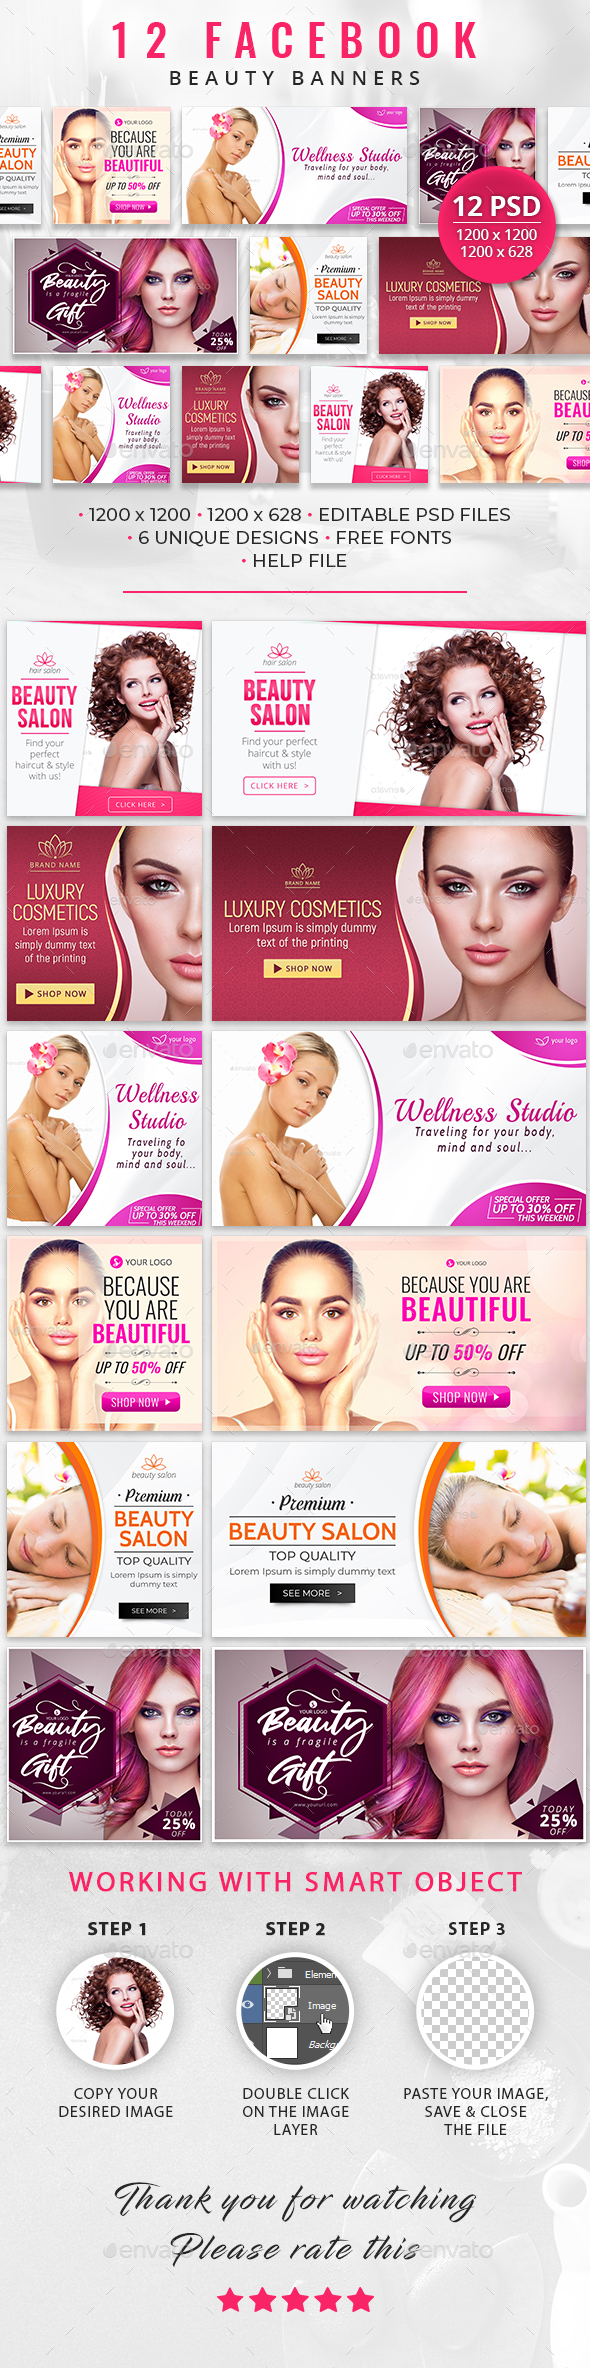 12 Facebook Beauty Banners